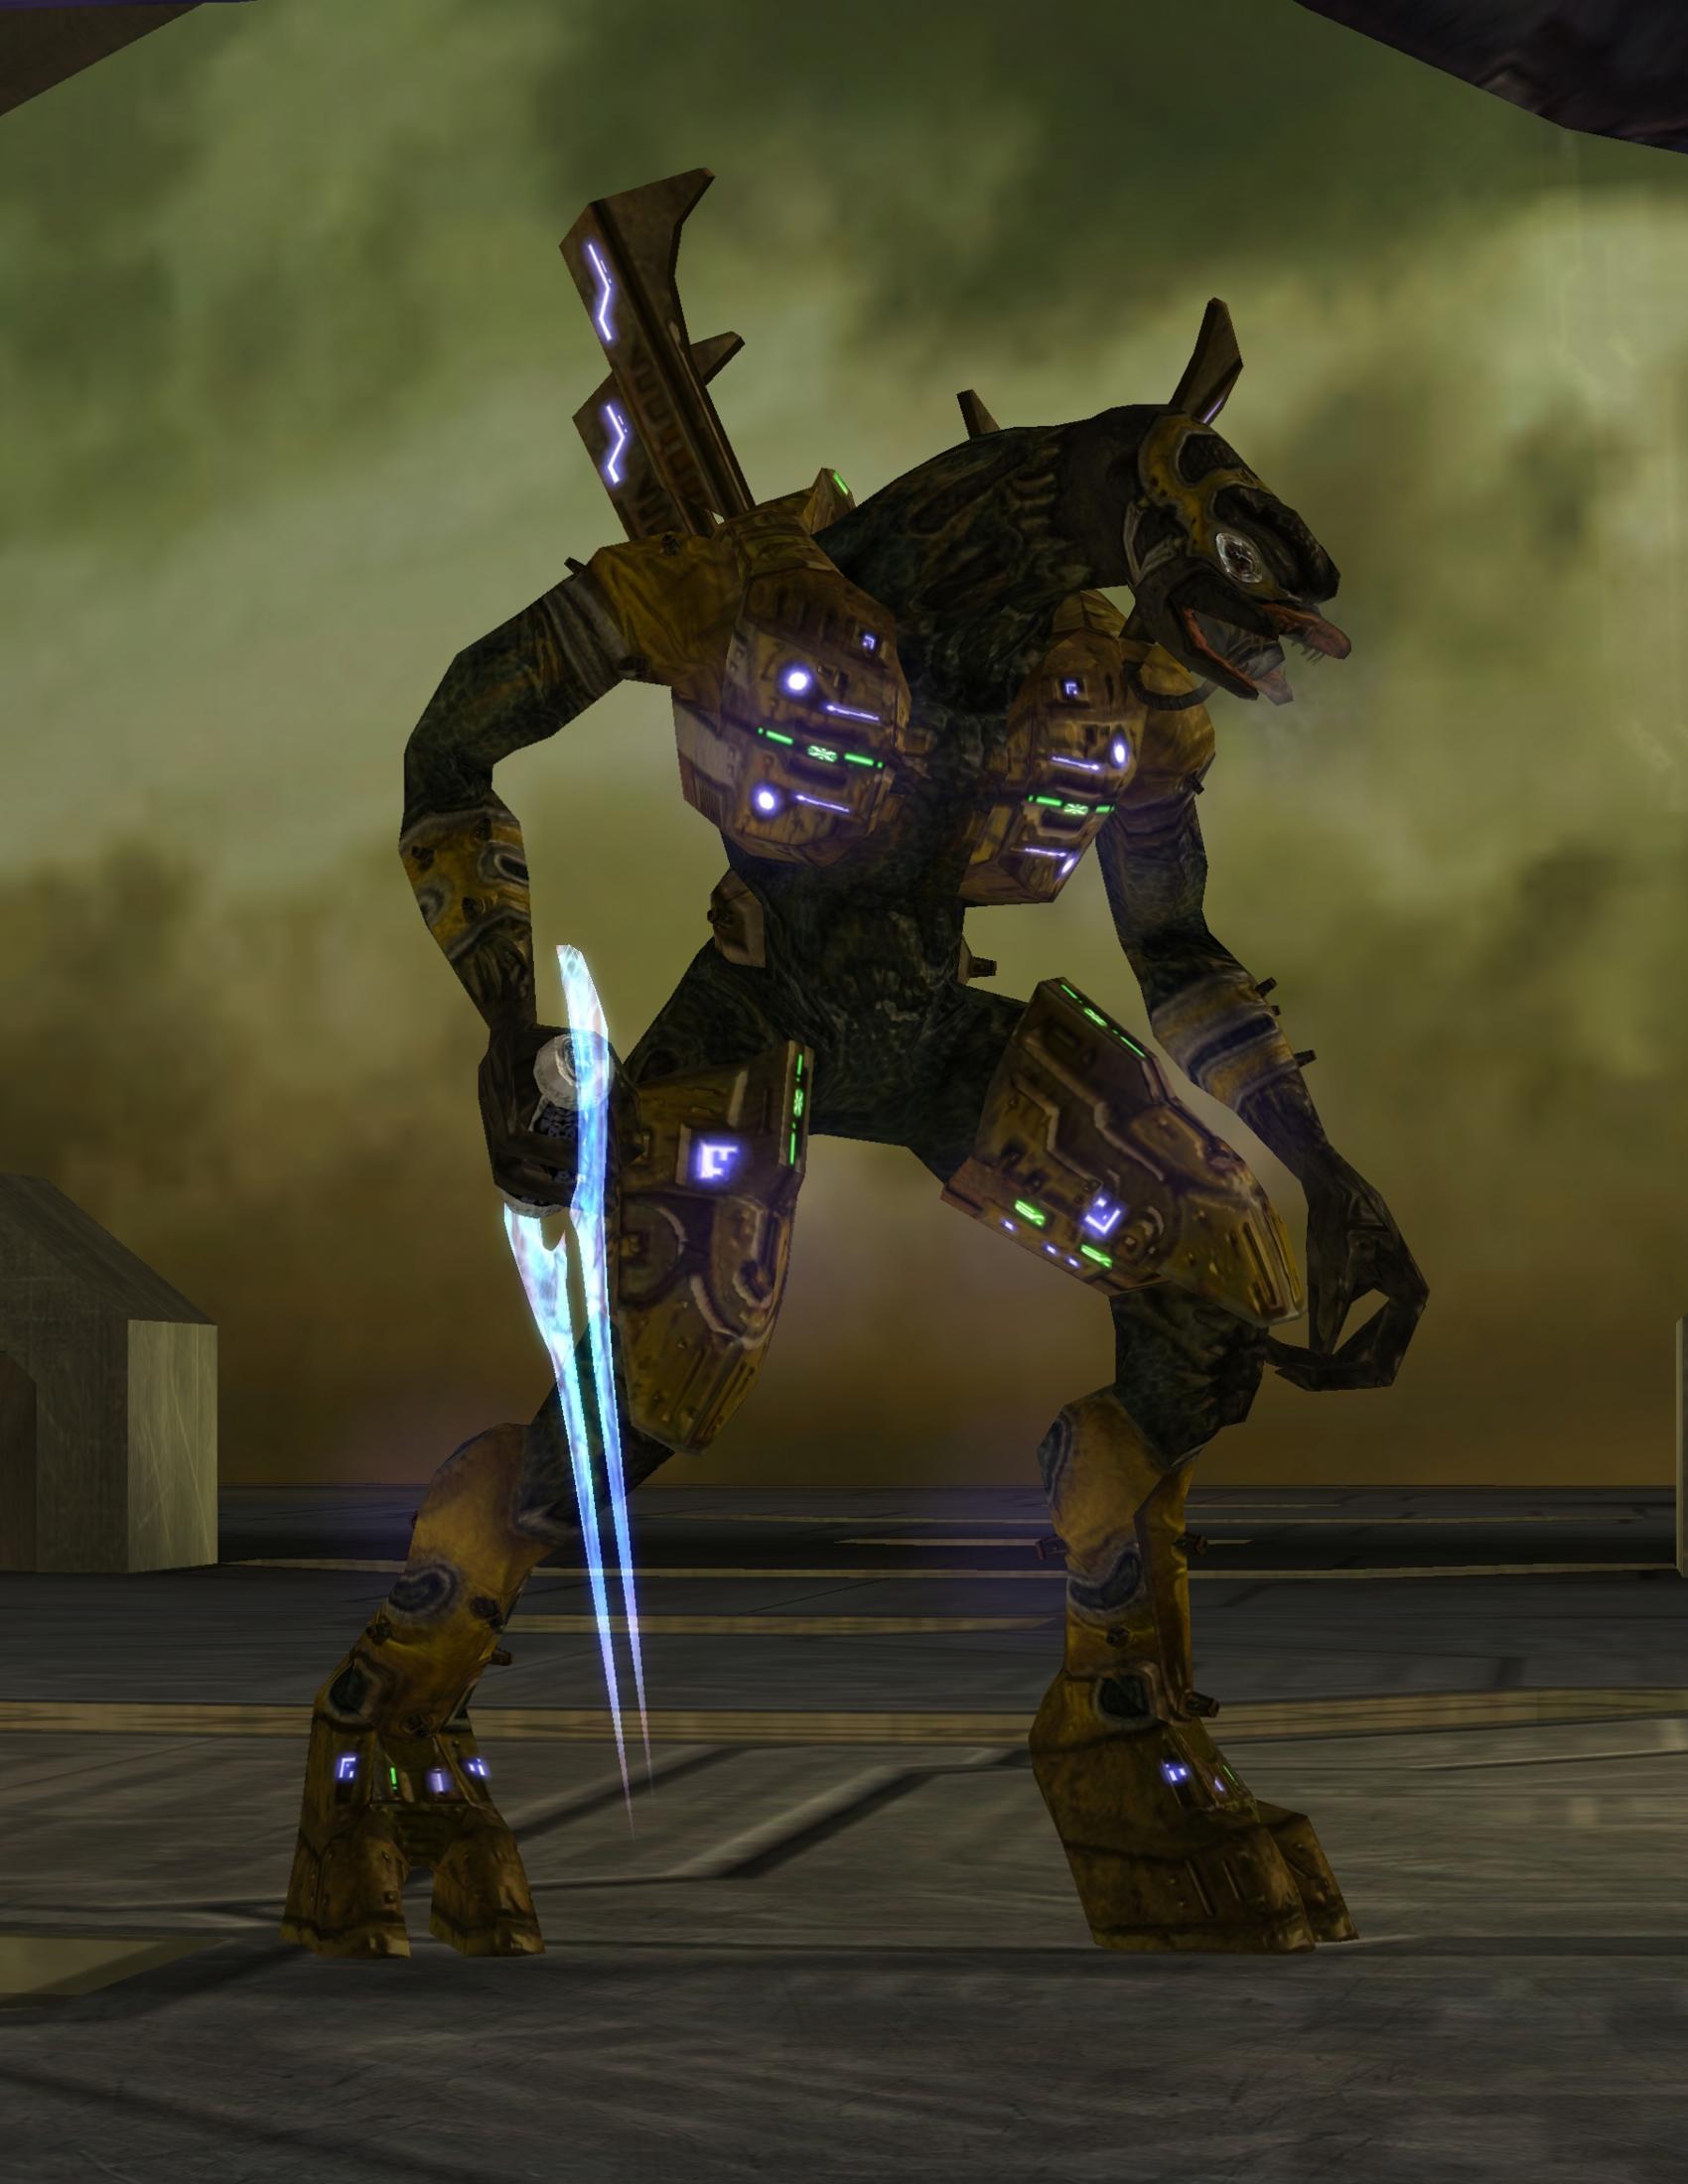 halo 3 matchmaking armor